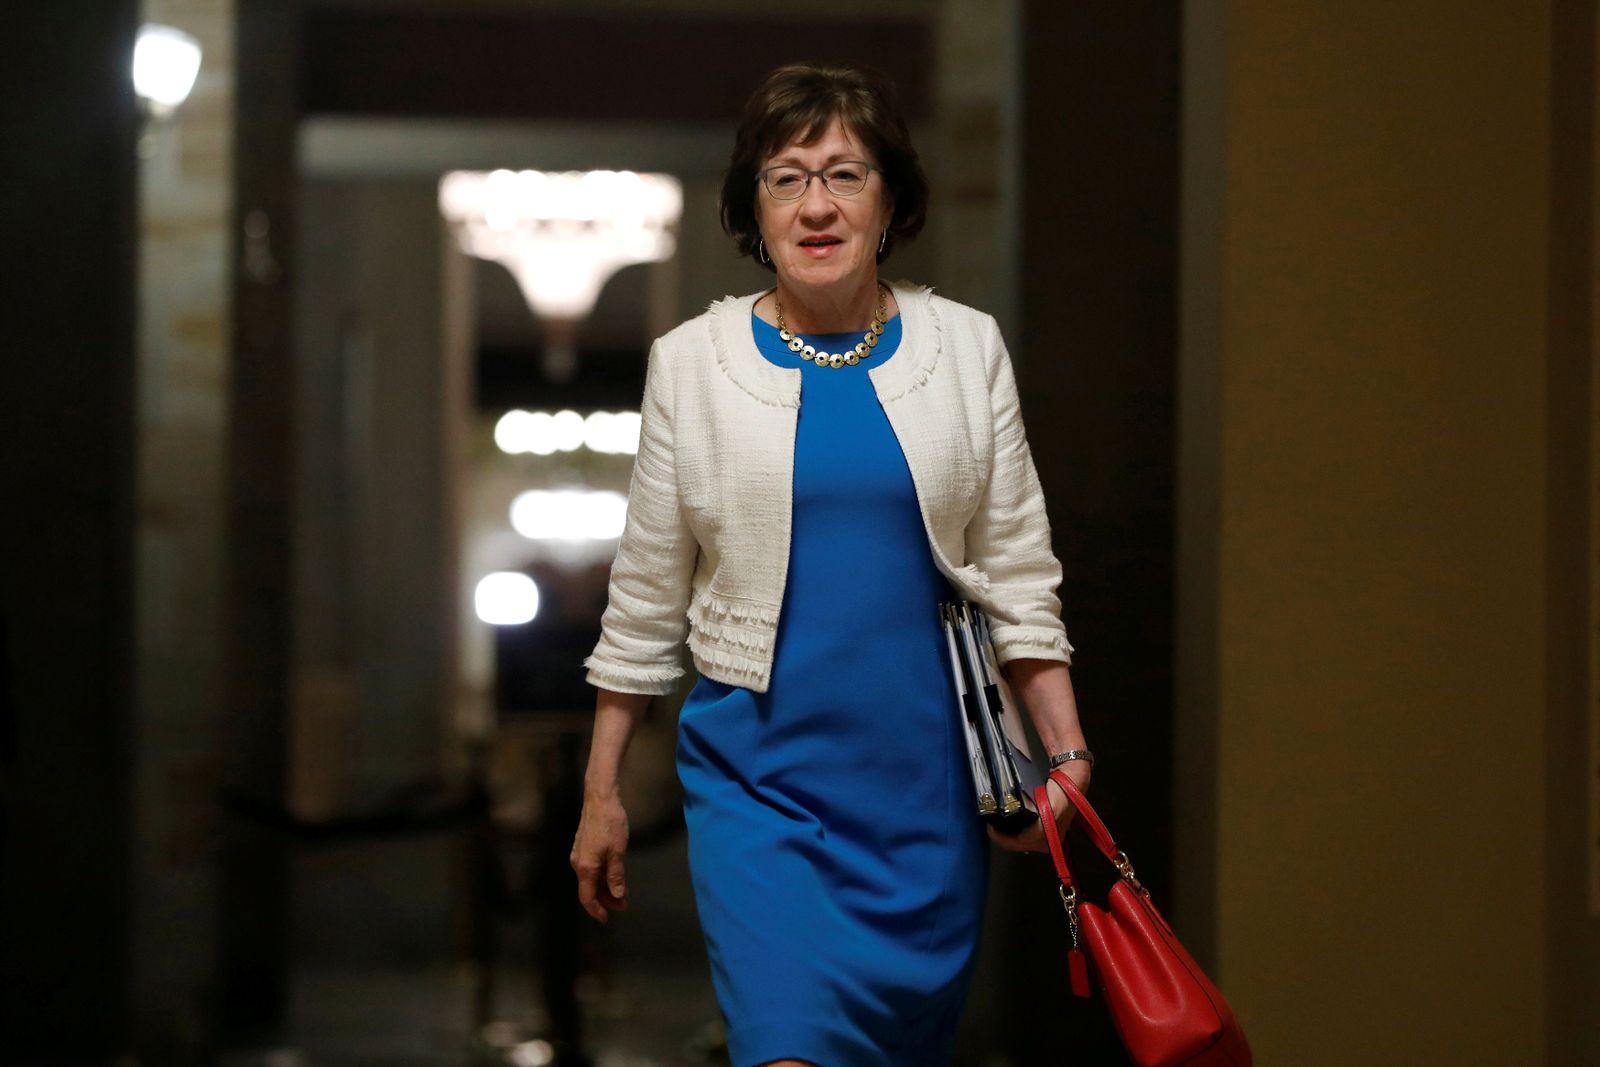 FILE PHOTO: Senator Susan Collins (R-ME) walks to the Senate floor on Capitol Hill in Washington